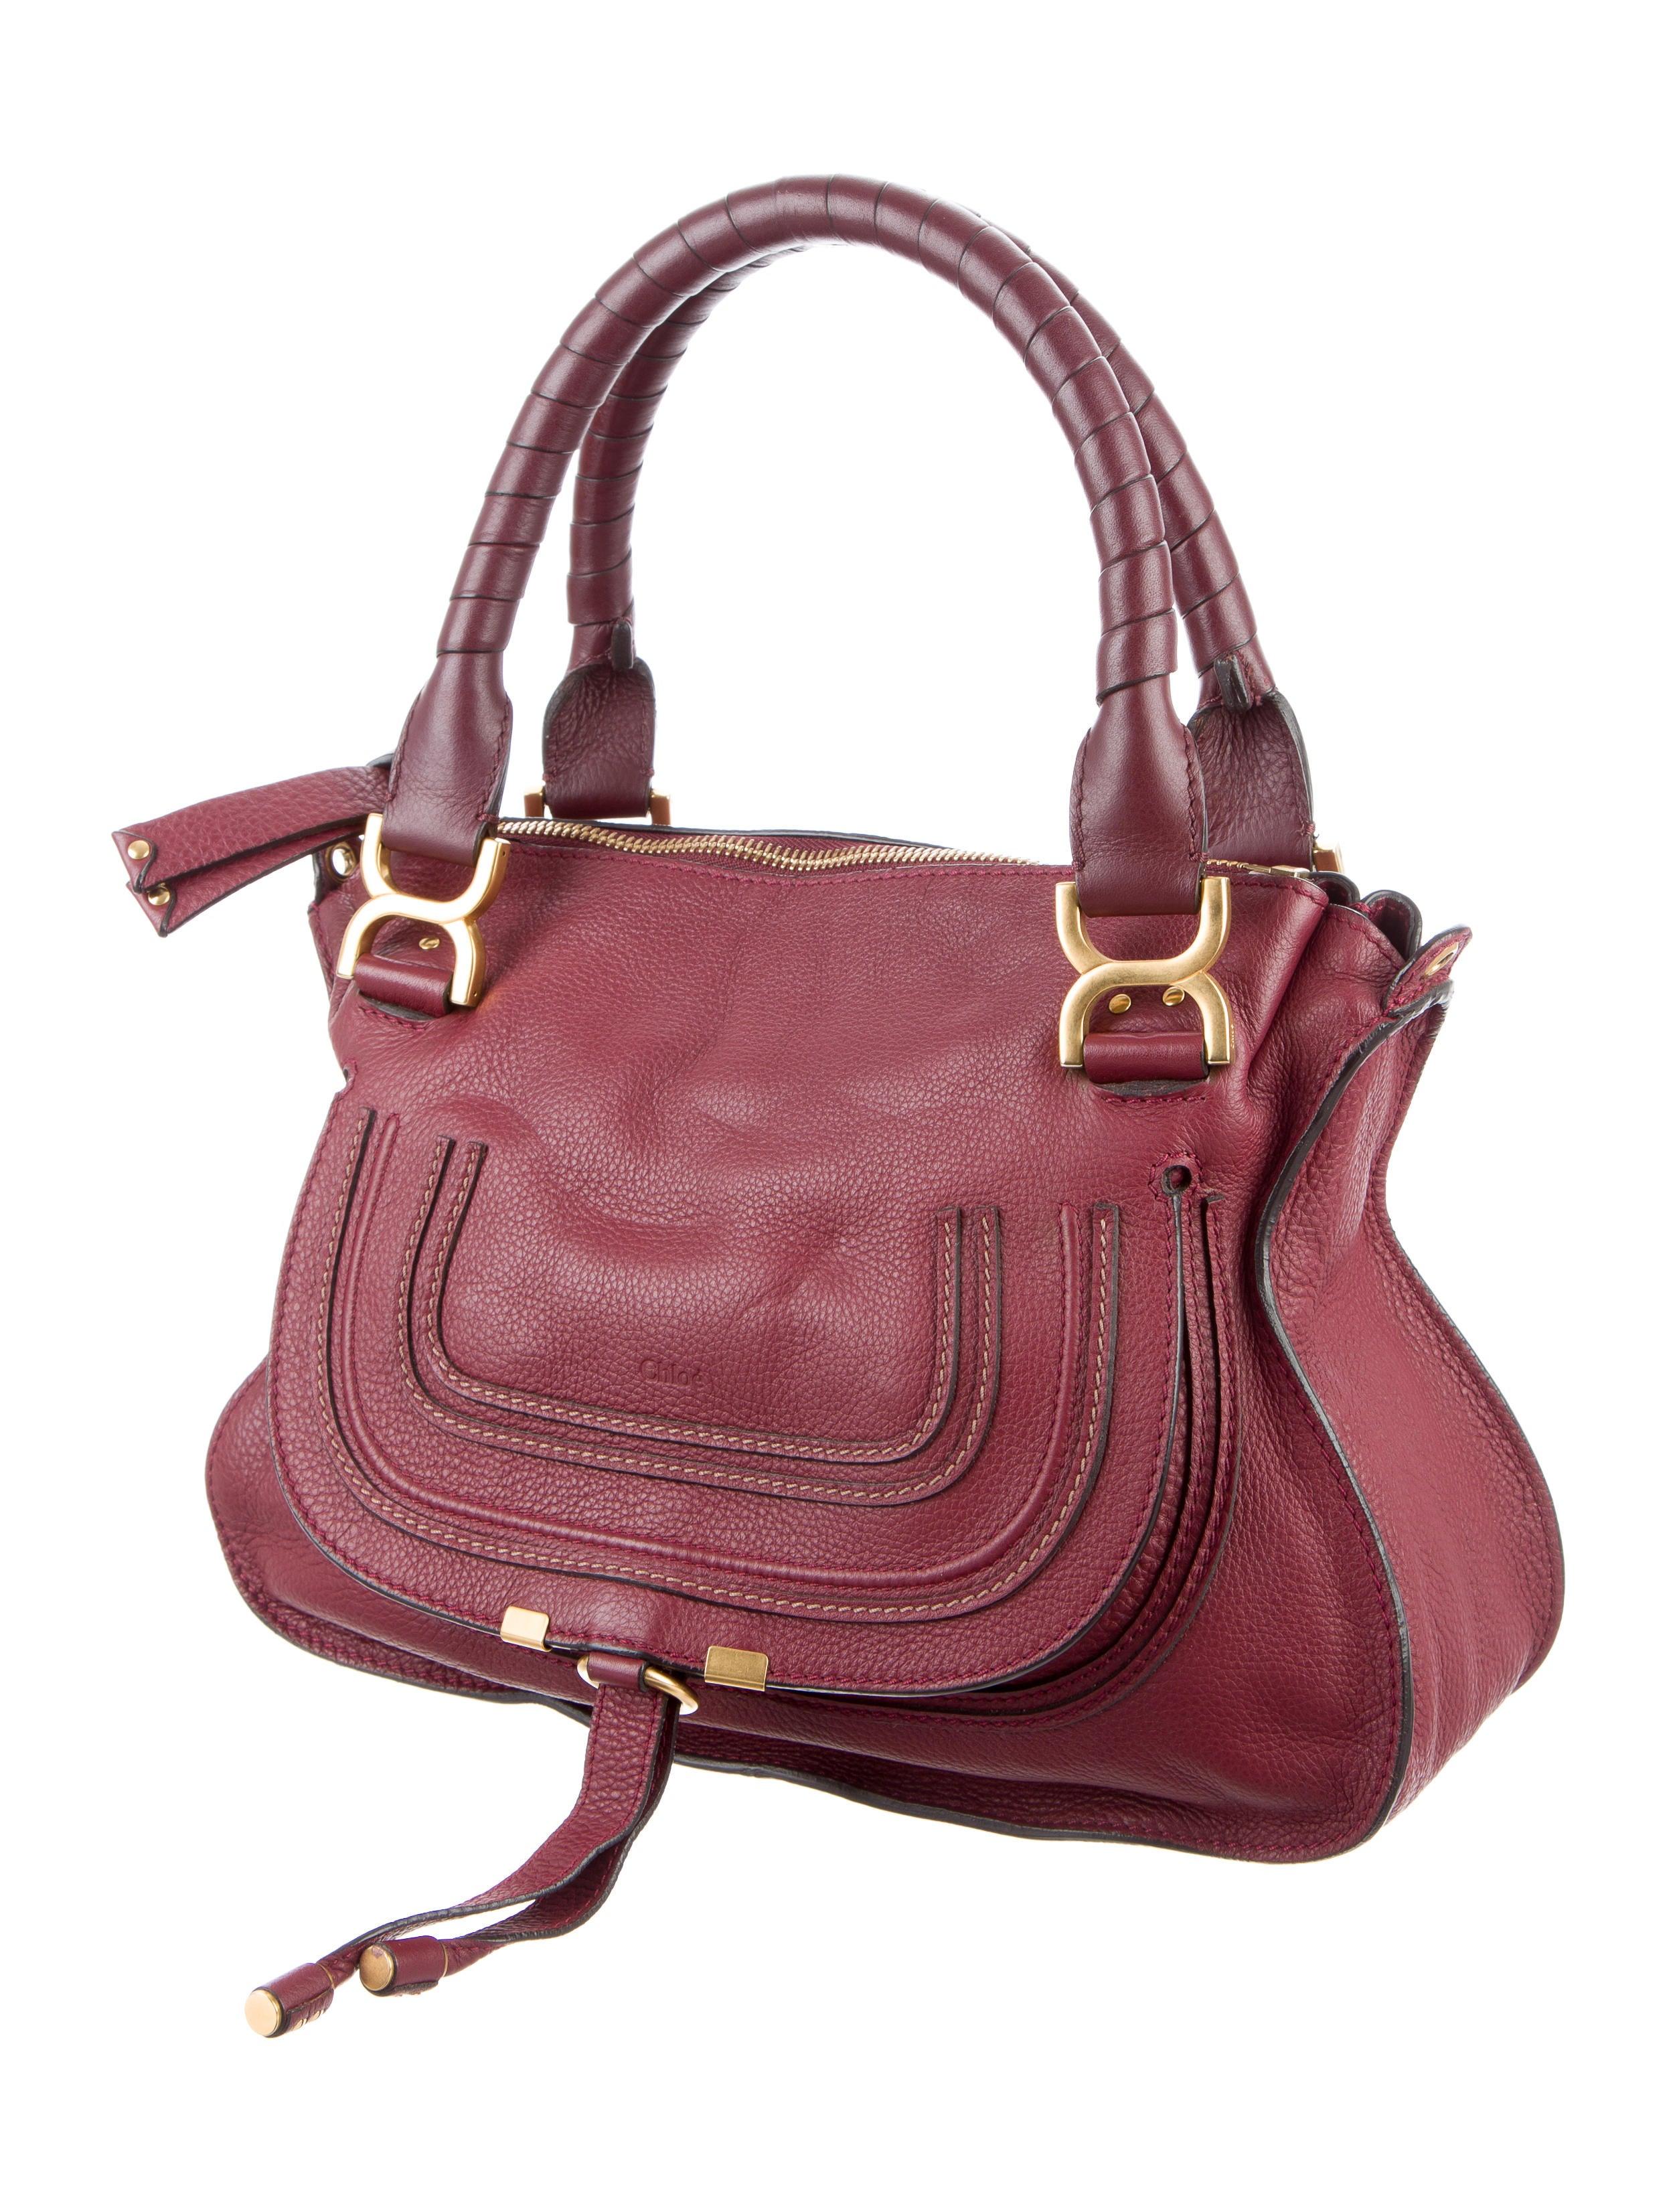 chlo medium marcie satchel handbags chl57046 the realreal. Black Bedroom Furniture Sets. Home Design Ideas